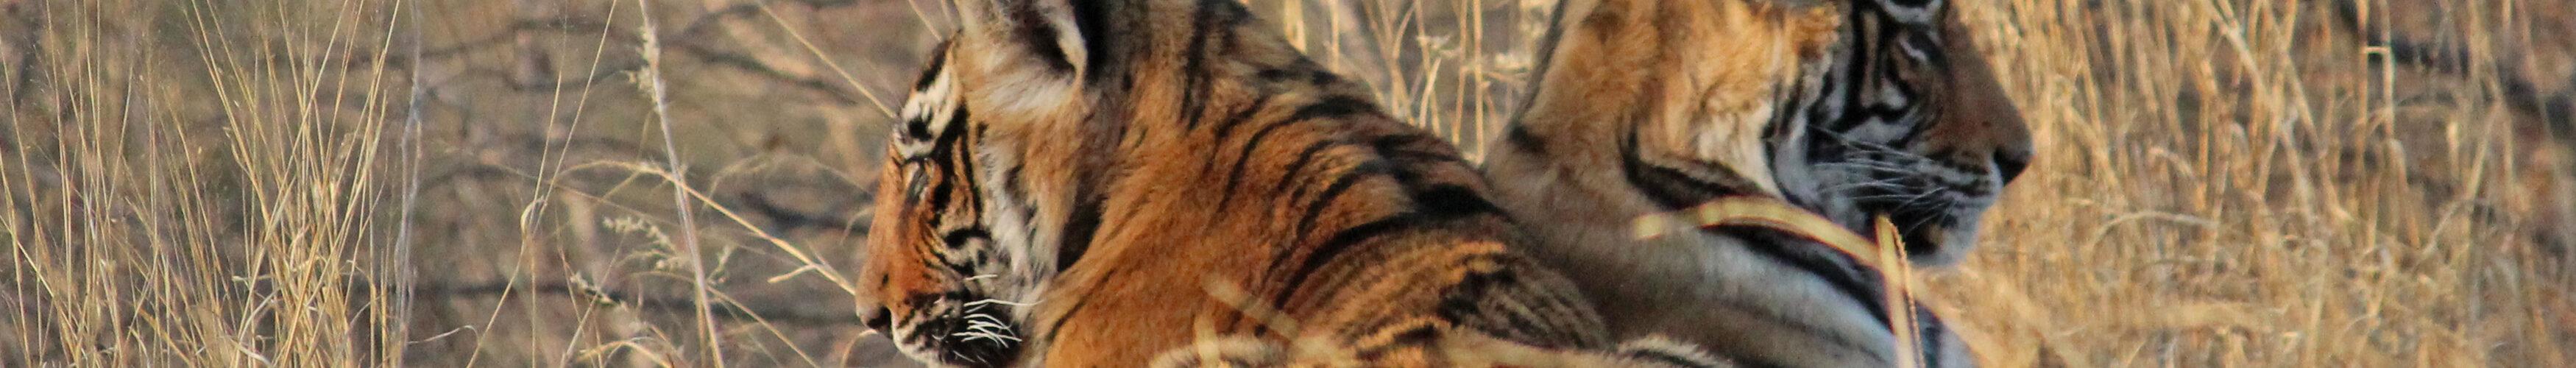 Tigerunger i Ranthambhore